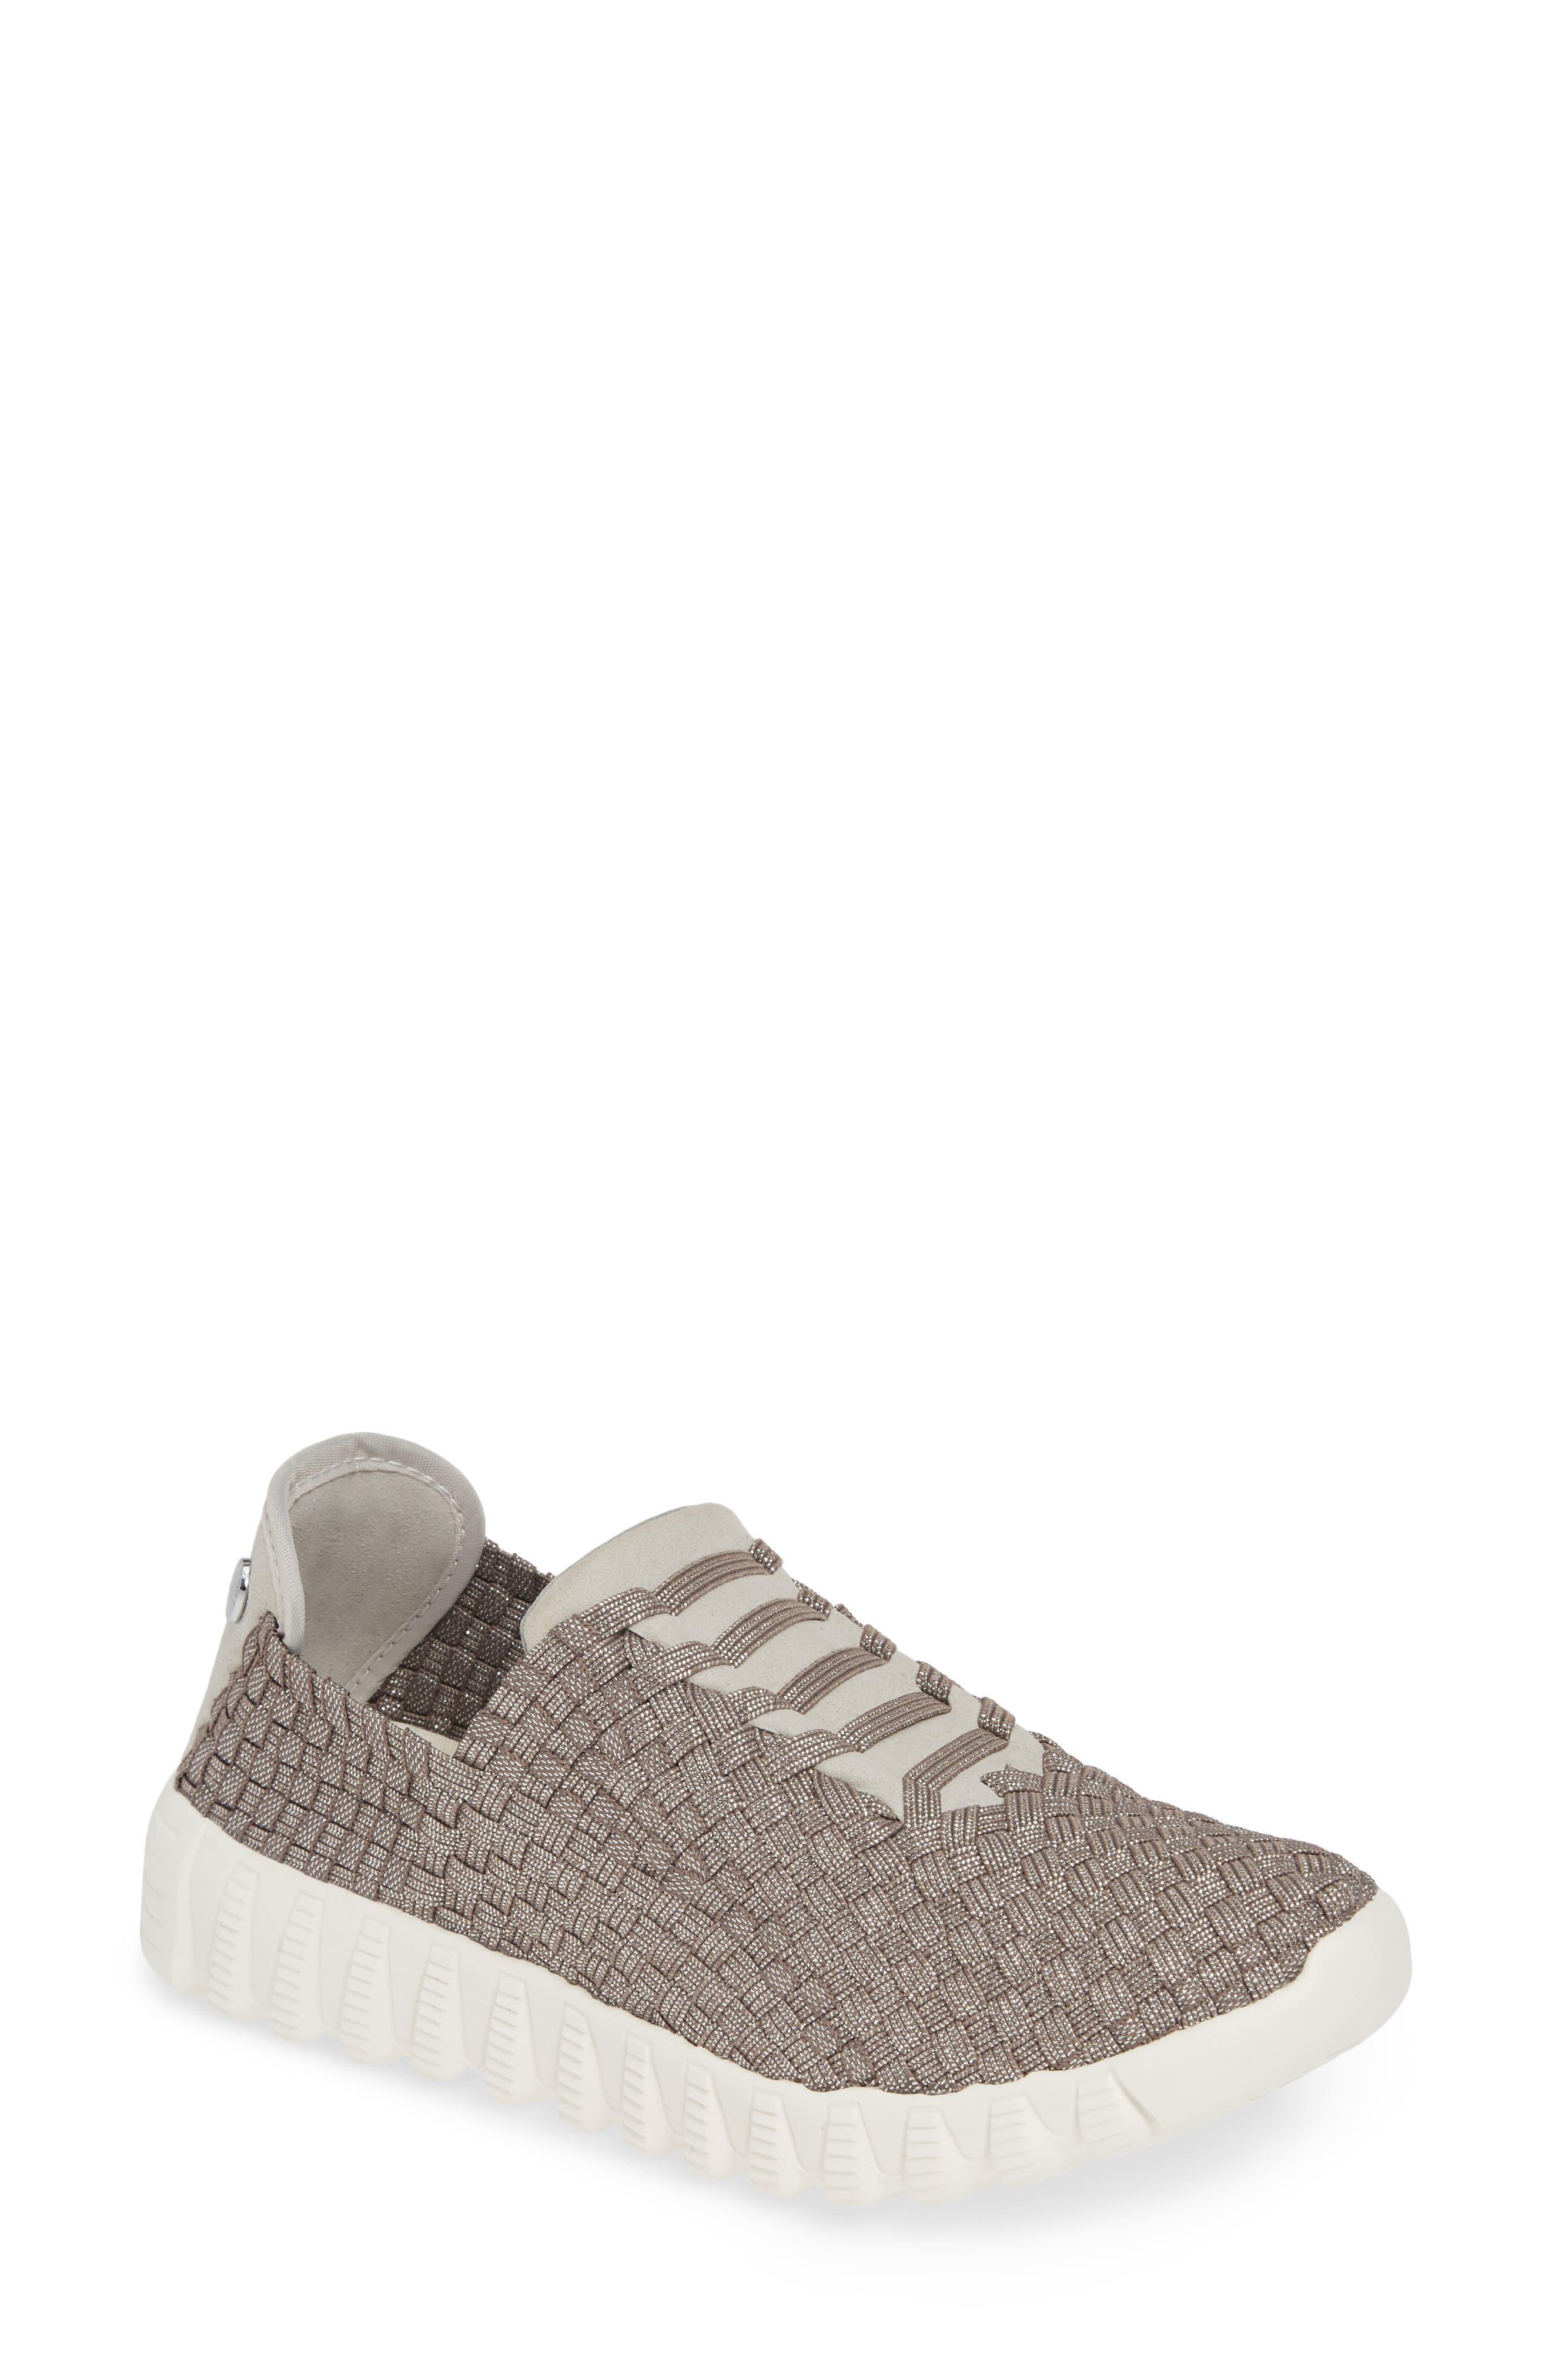 Vivaldi Slip-On Sneaker